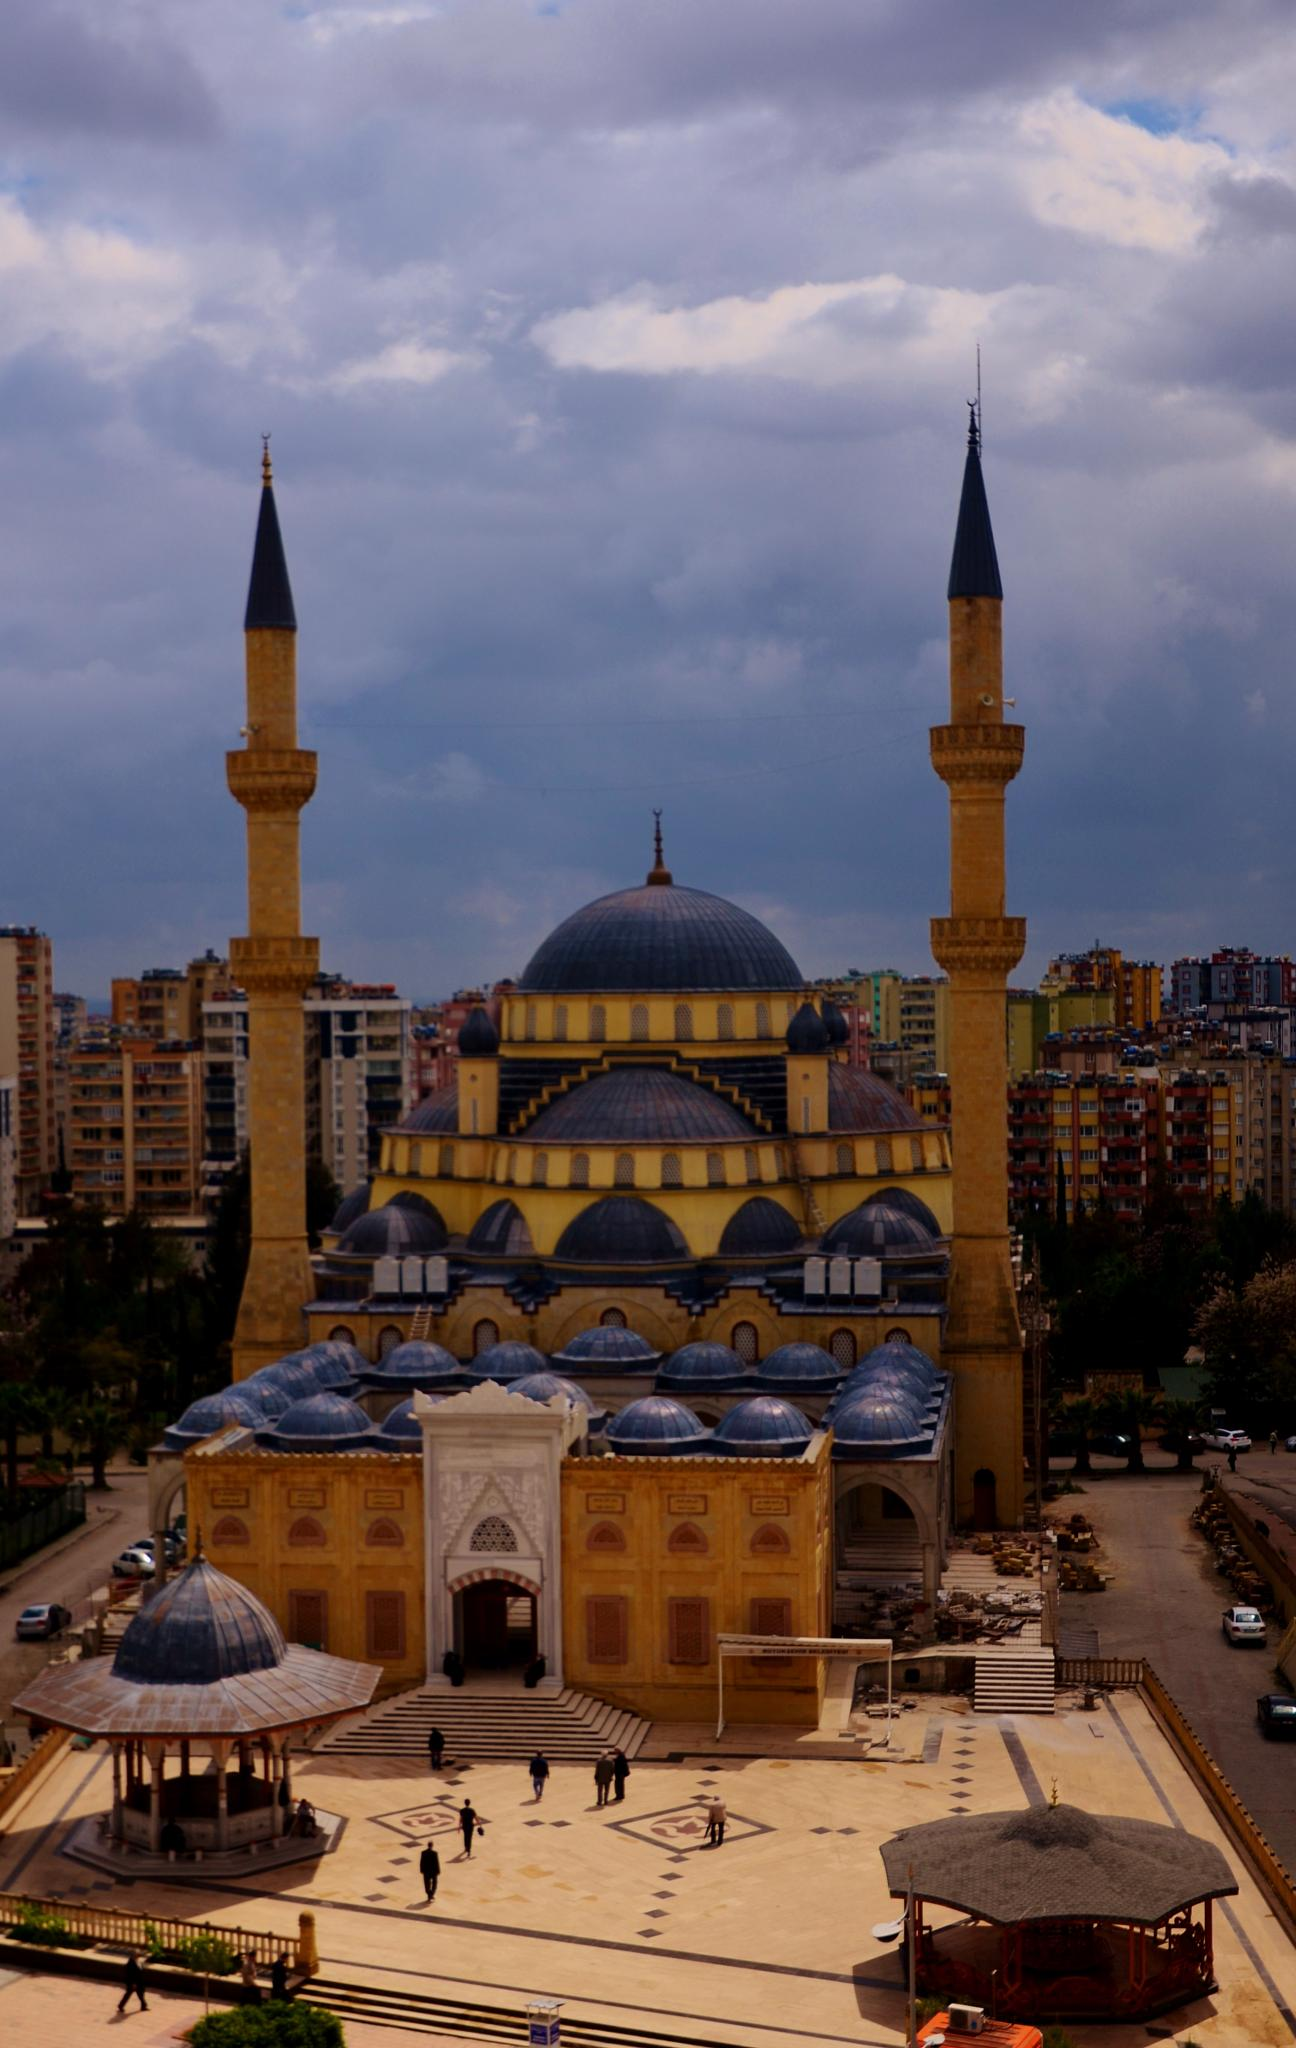 Ramazanoğlu Mosque-Adana by seyrani